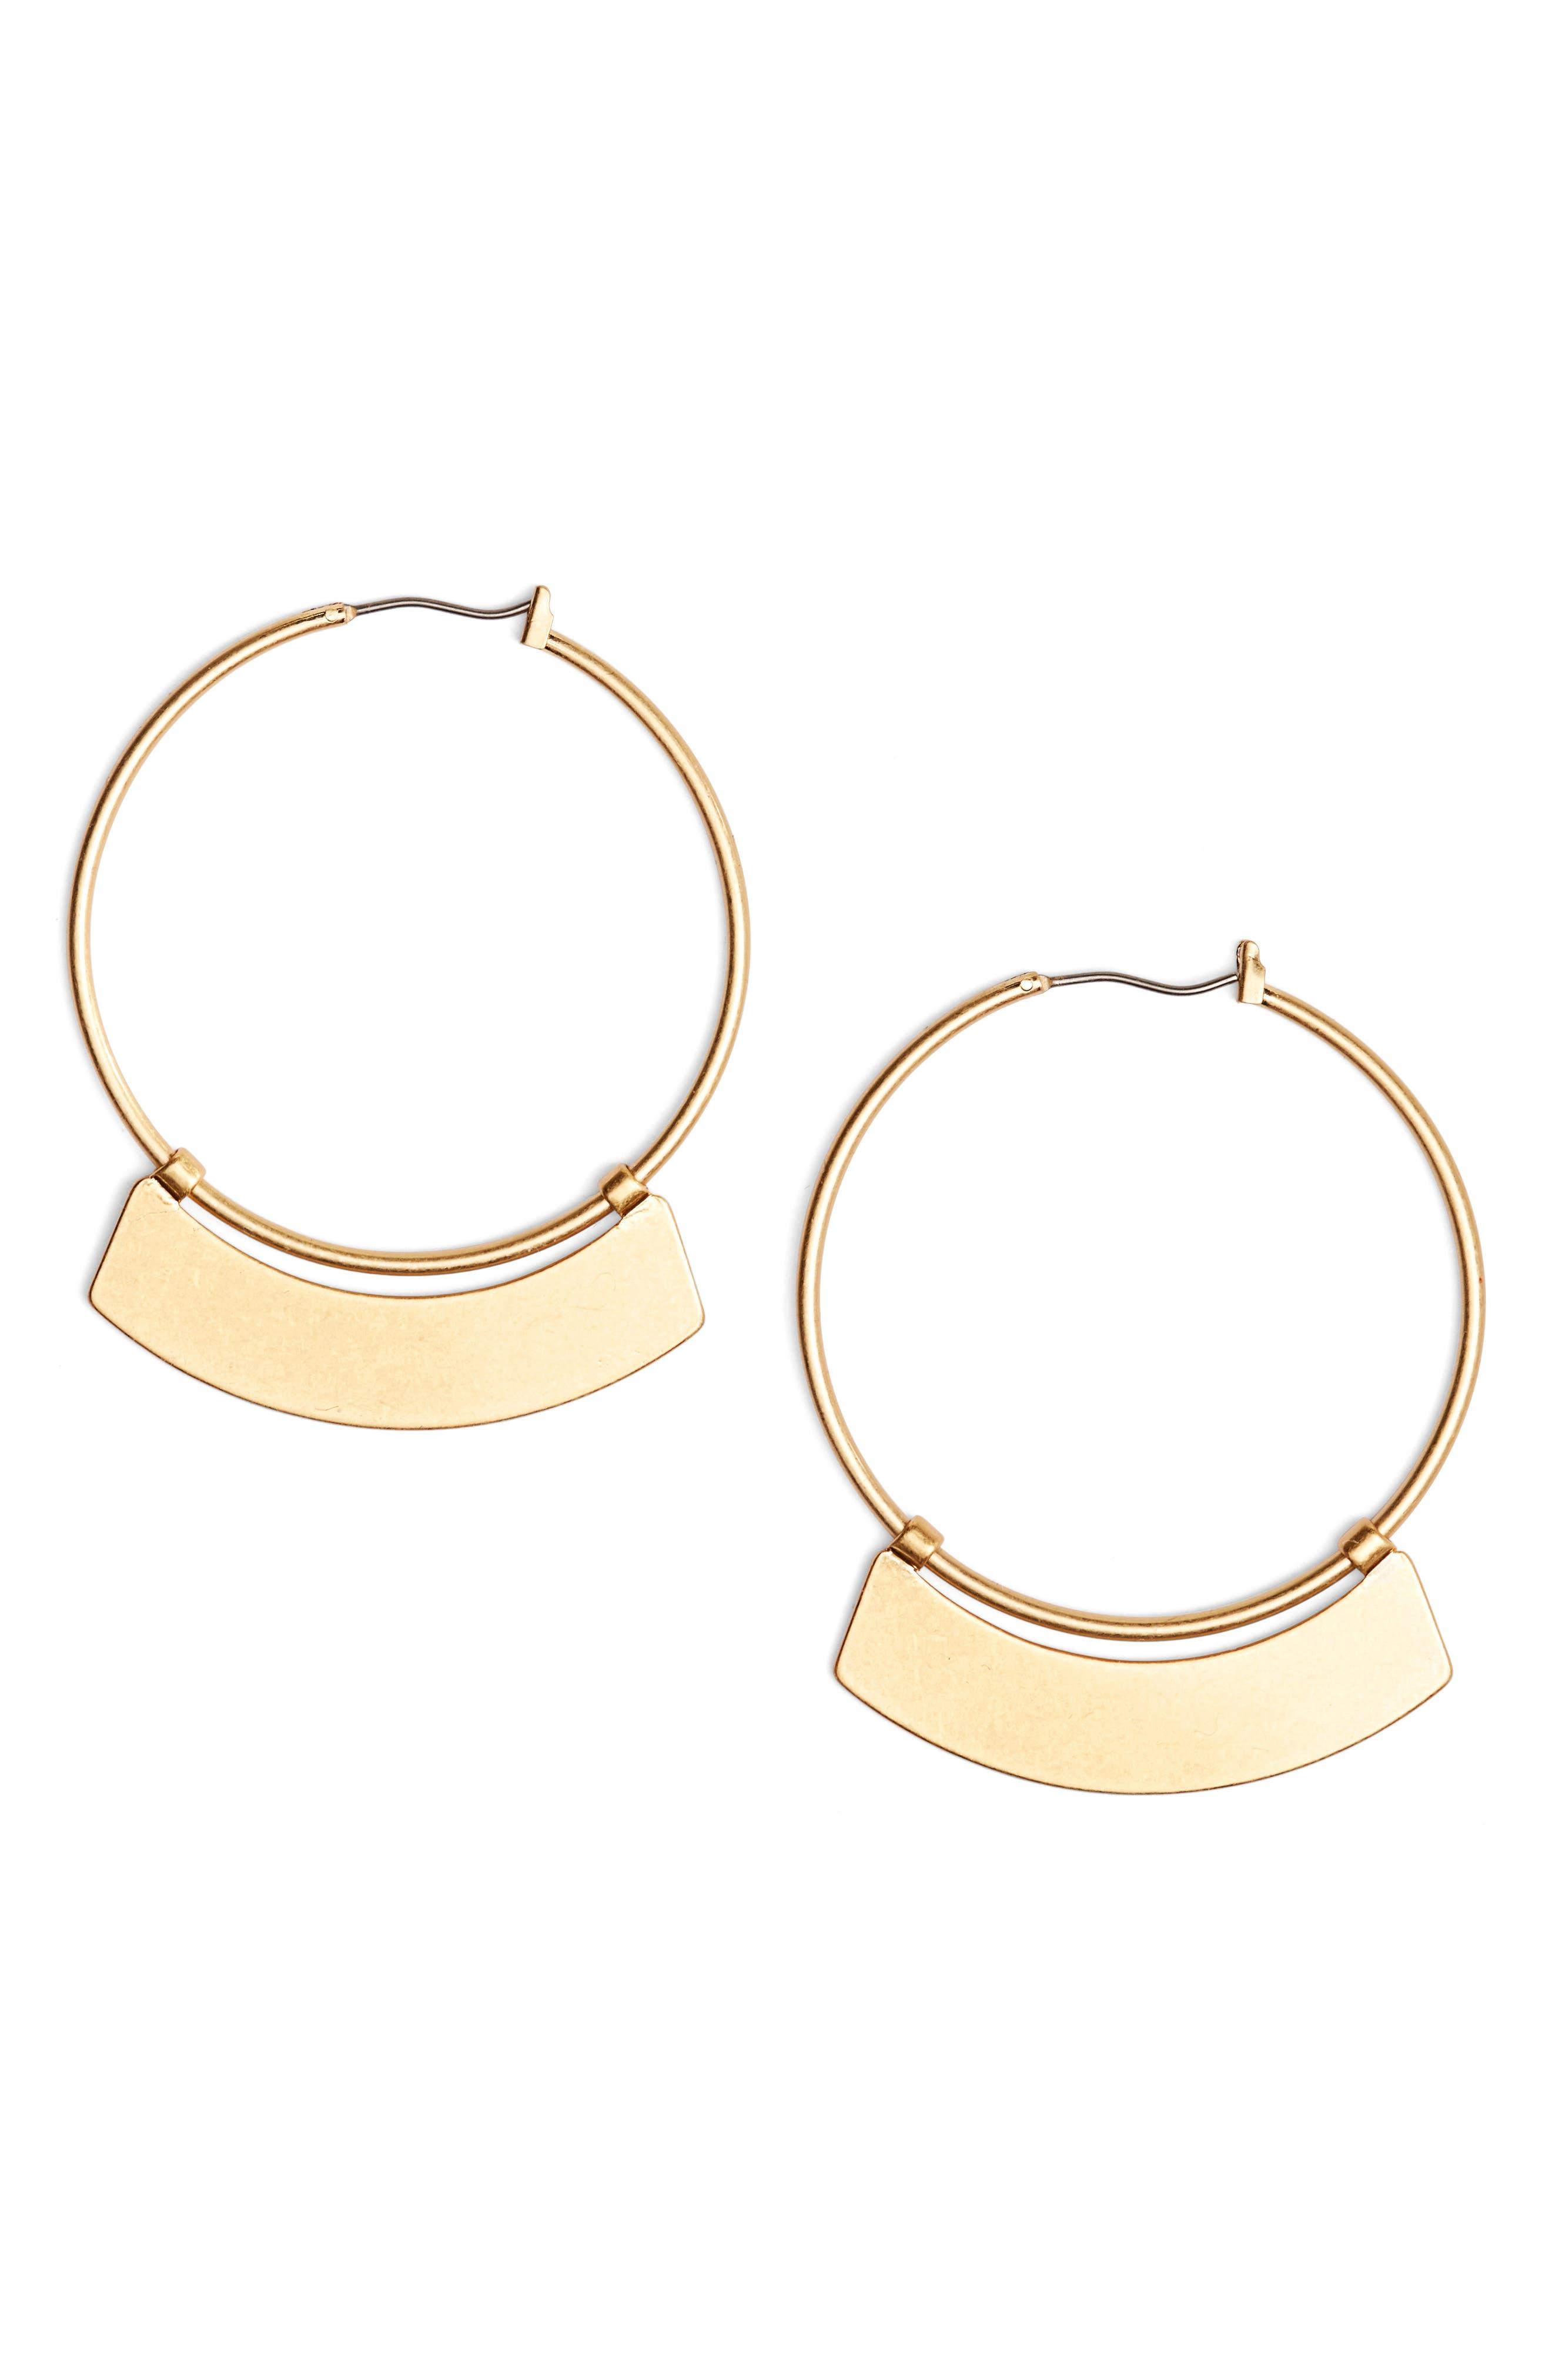 Madewell Crescent Hoop Earrings